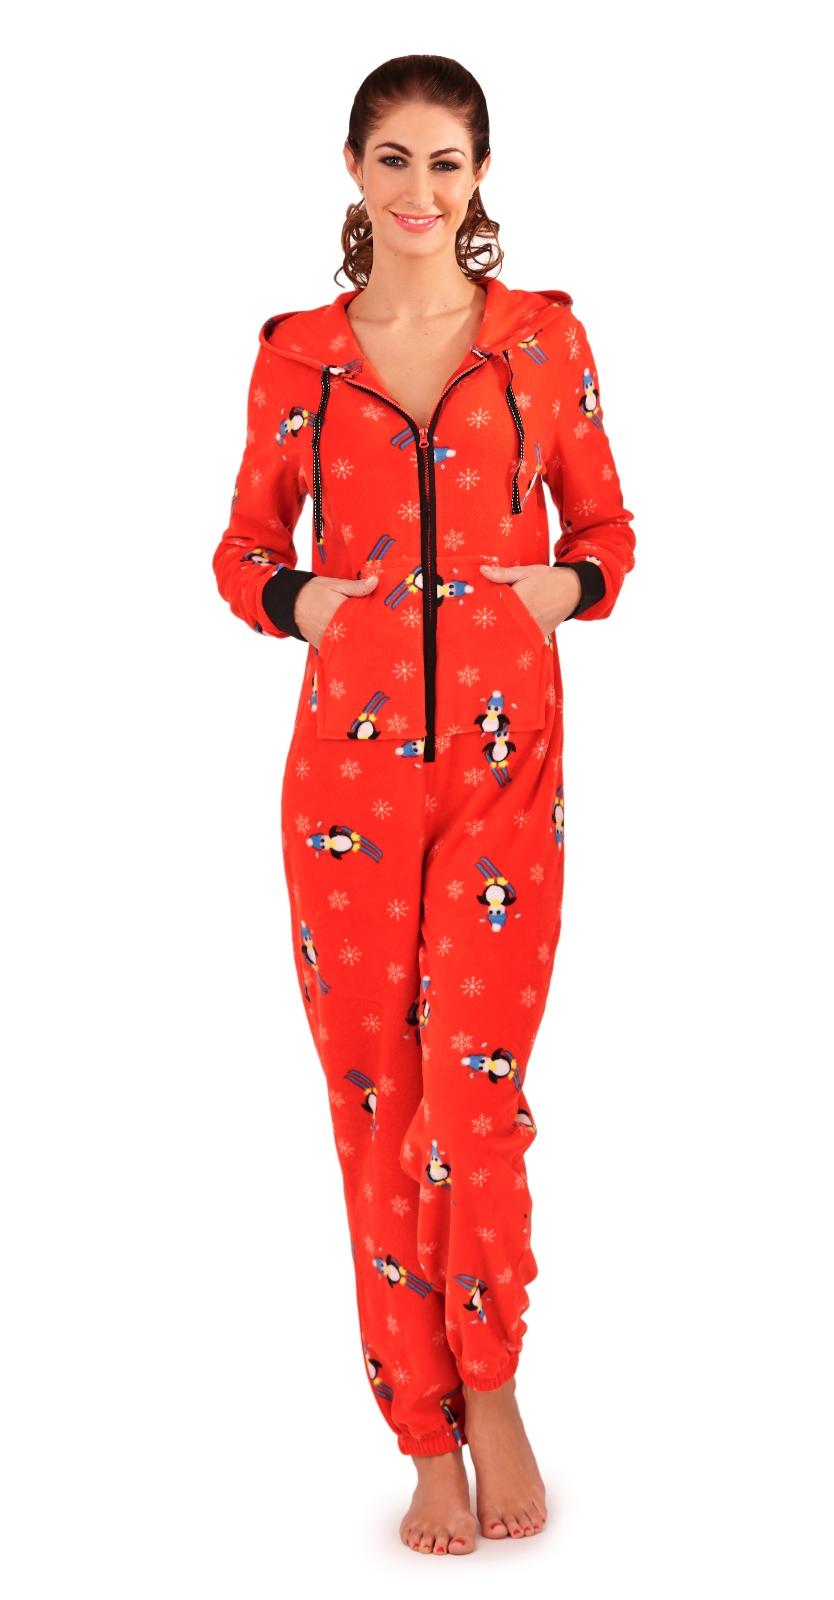 Simple Women Clubwear Sleeveless Playsuit Ladies Bodycon Party Jumpsuitu0026Romper Trousers | EBay